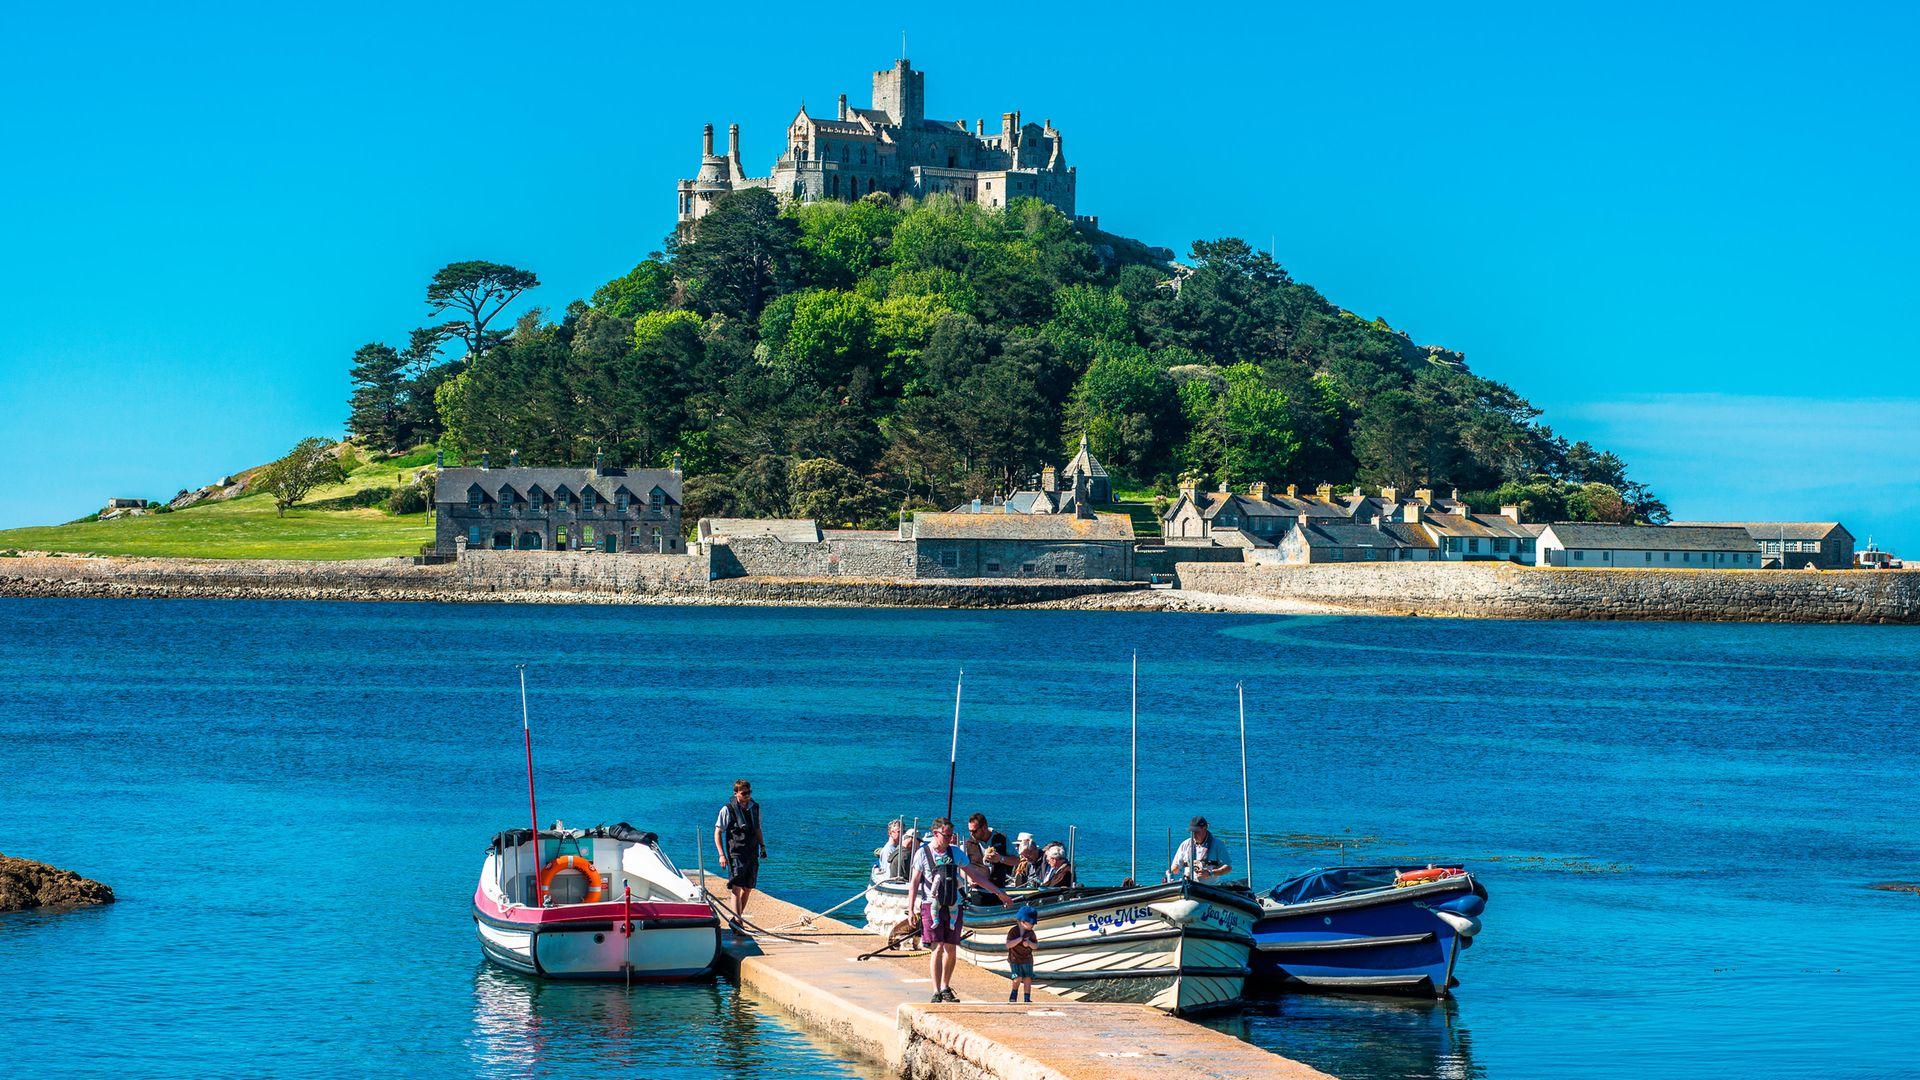 St Michael's Mount, Marazion, Cornwall - Credit: Education Images/Universal Image